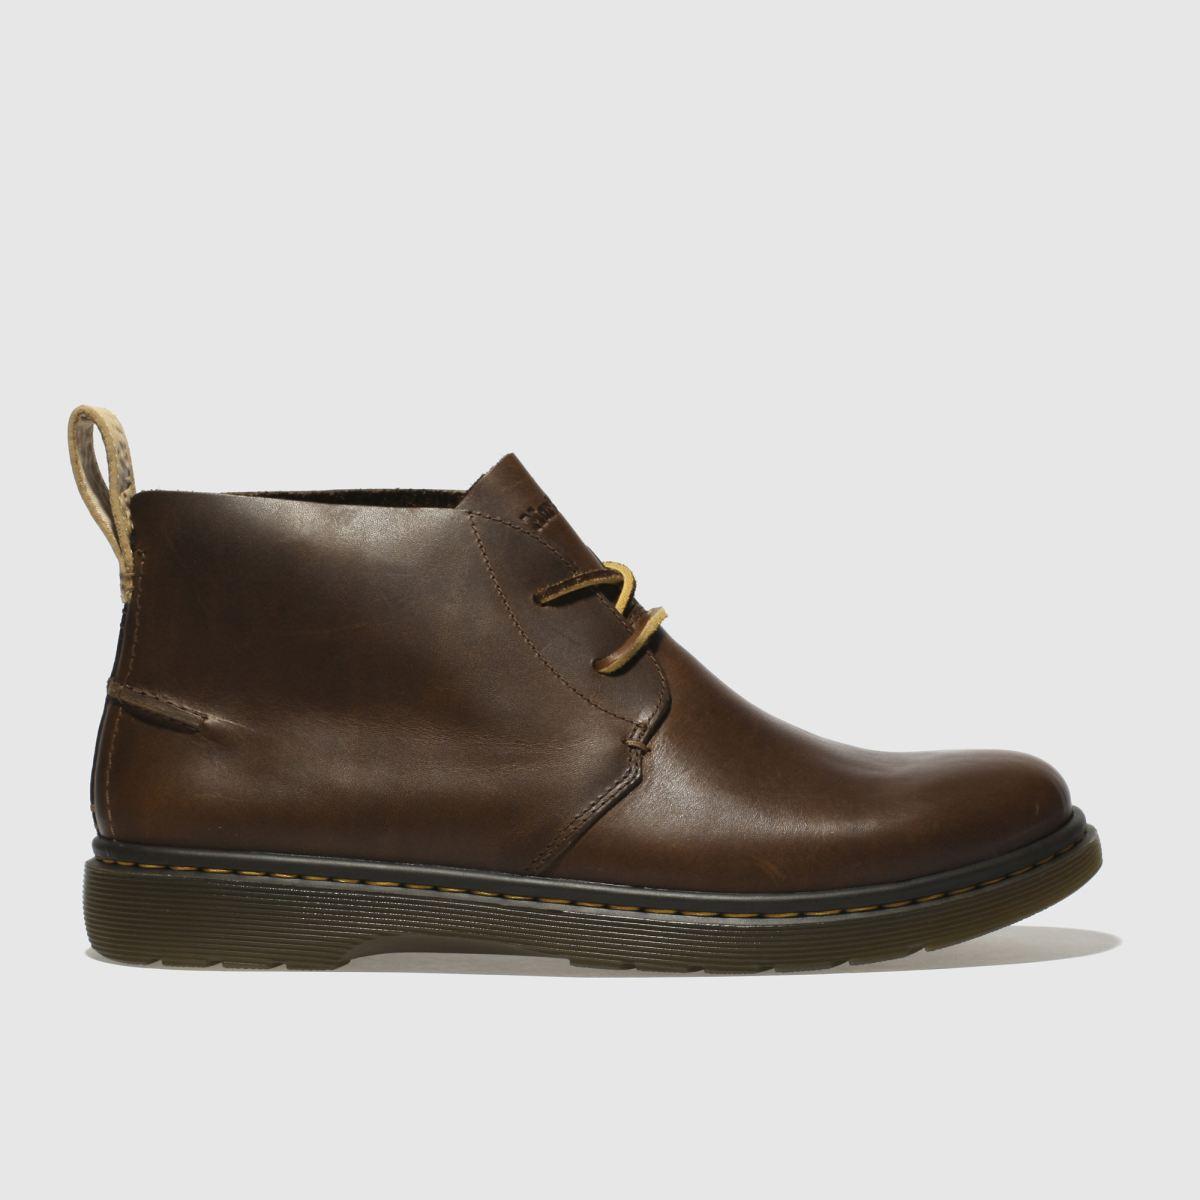 Dr Martens Tan Ember Boots